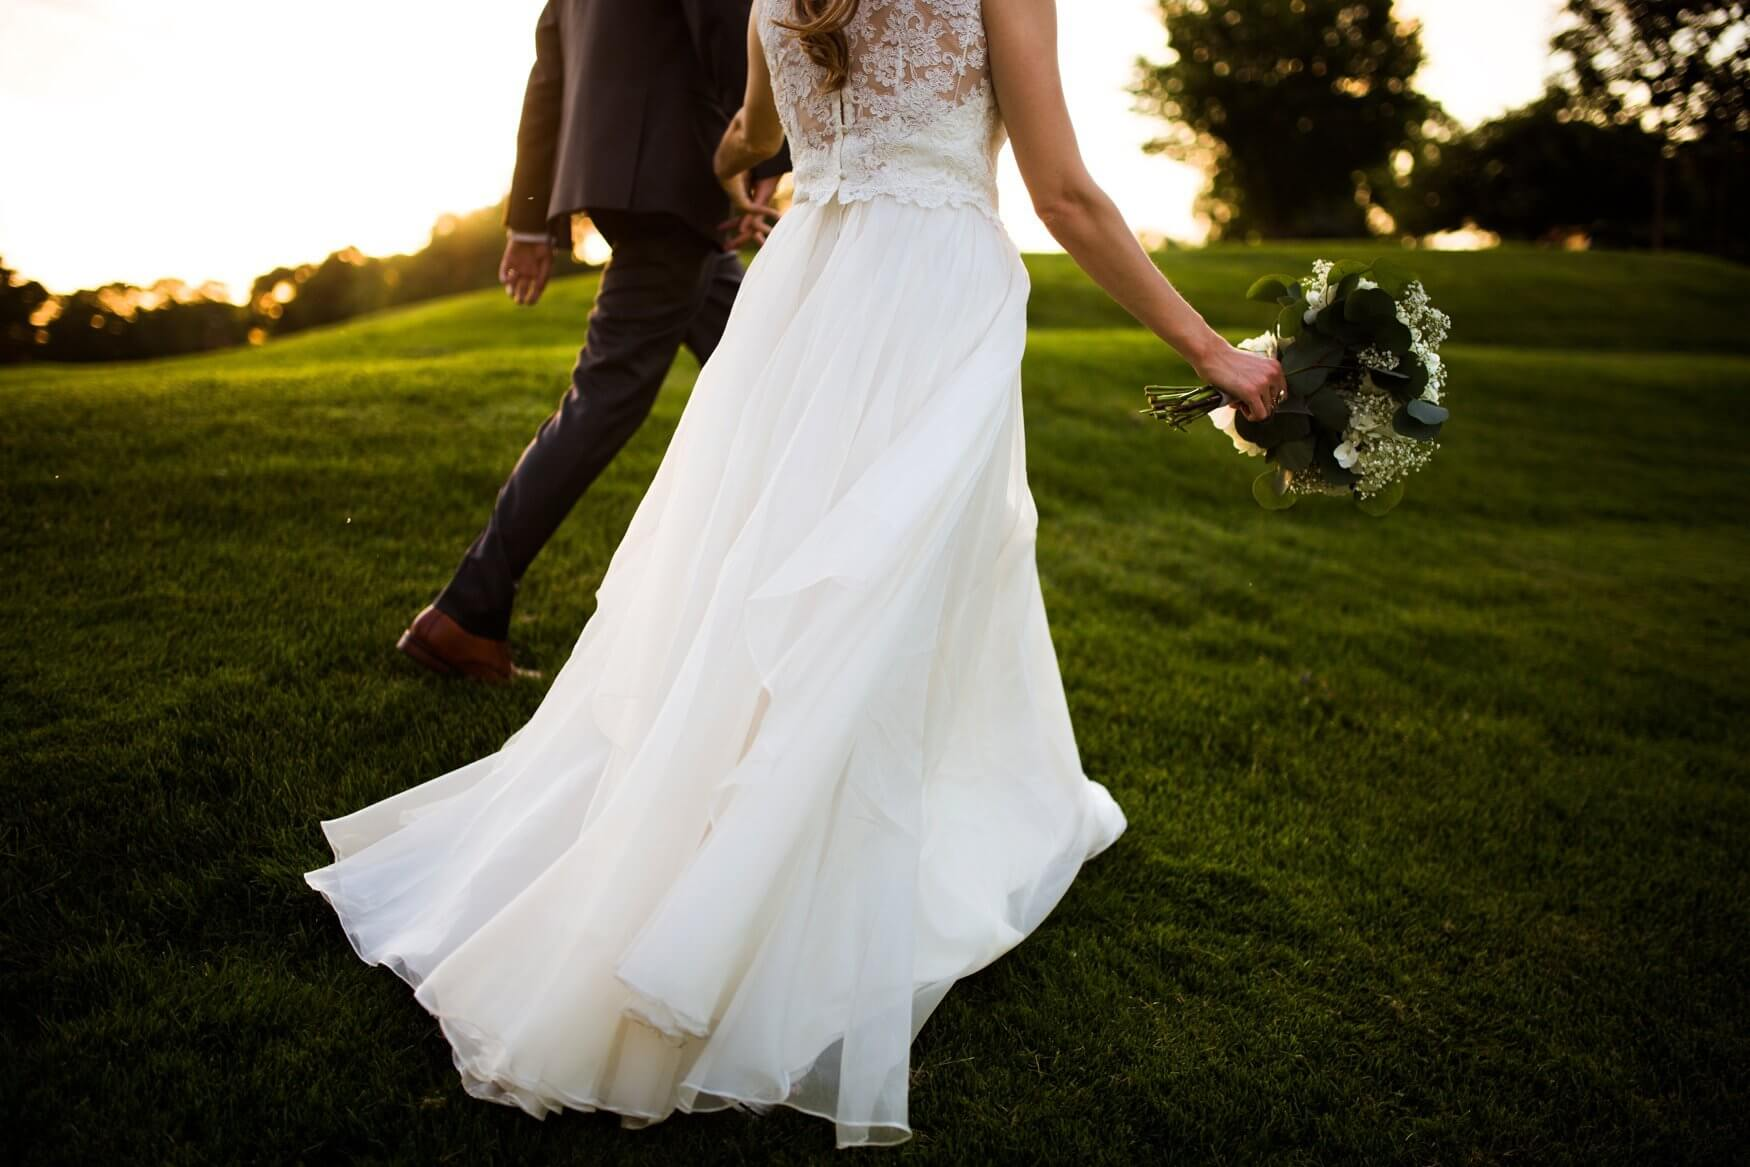 golden hour photos | bride with lace top separates | Minnesota wedding photographer Studio KH wedding dress details | wedding blog | Sixpence Events 70 Ways to Photograph Your Wedding Dress.jpg